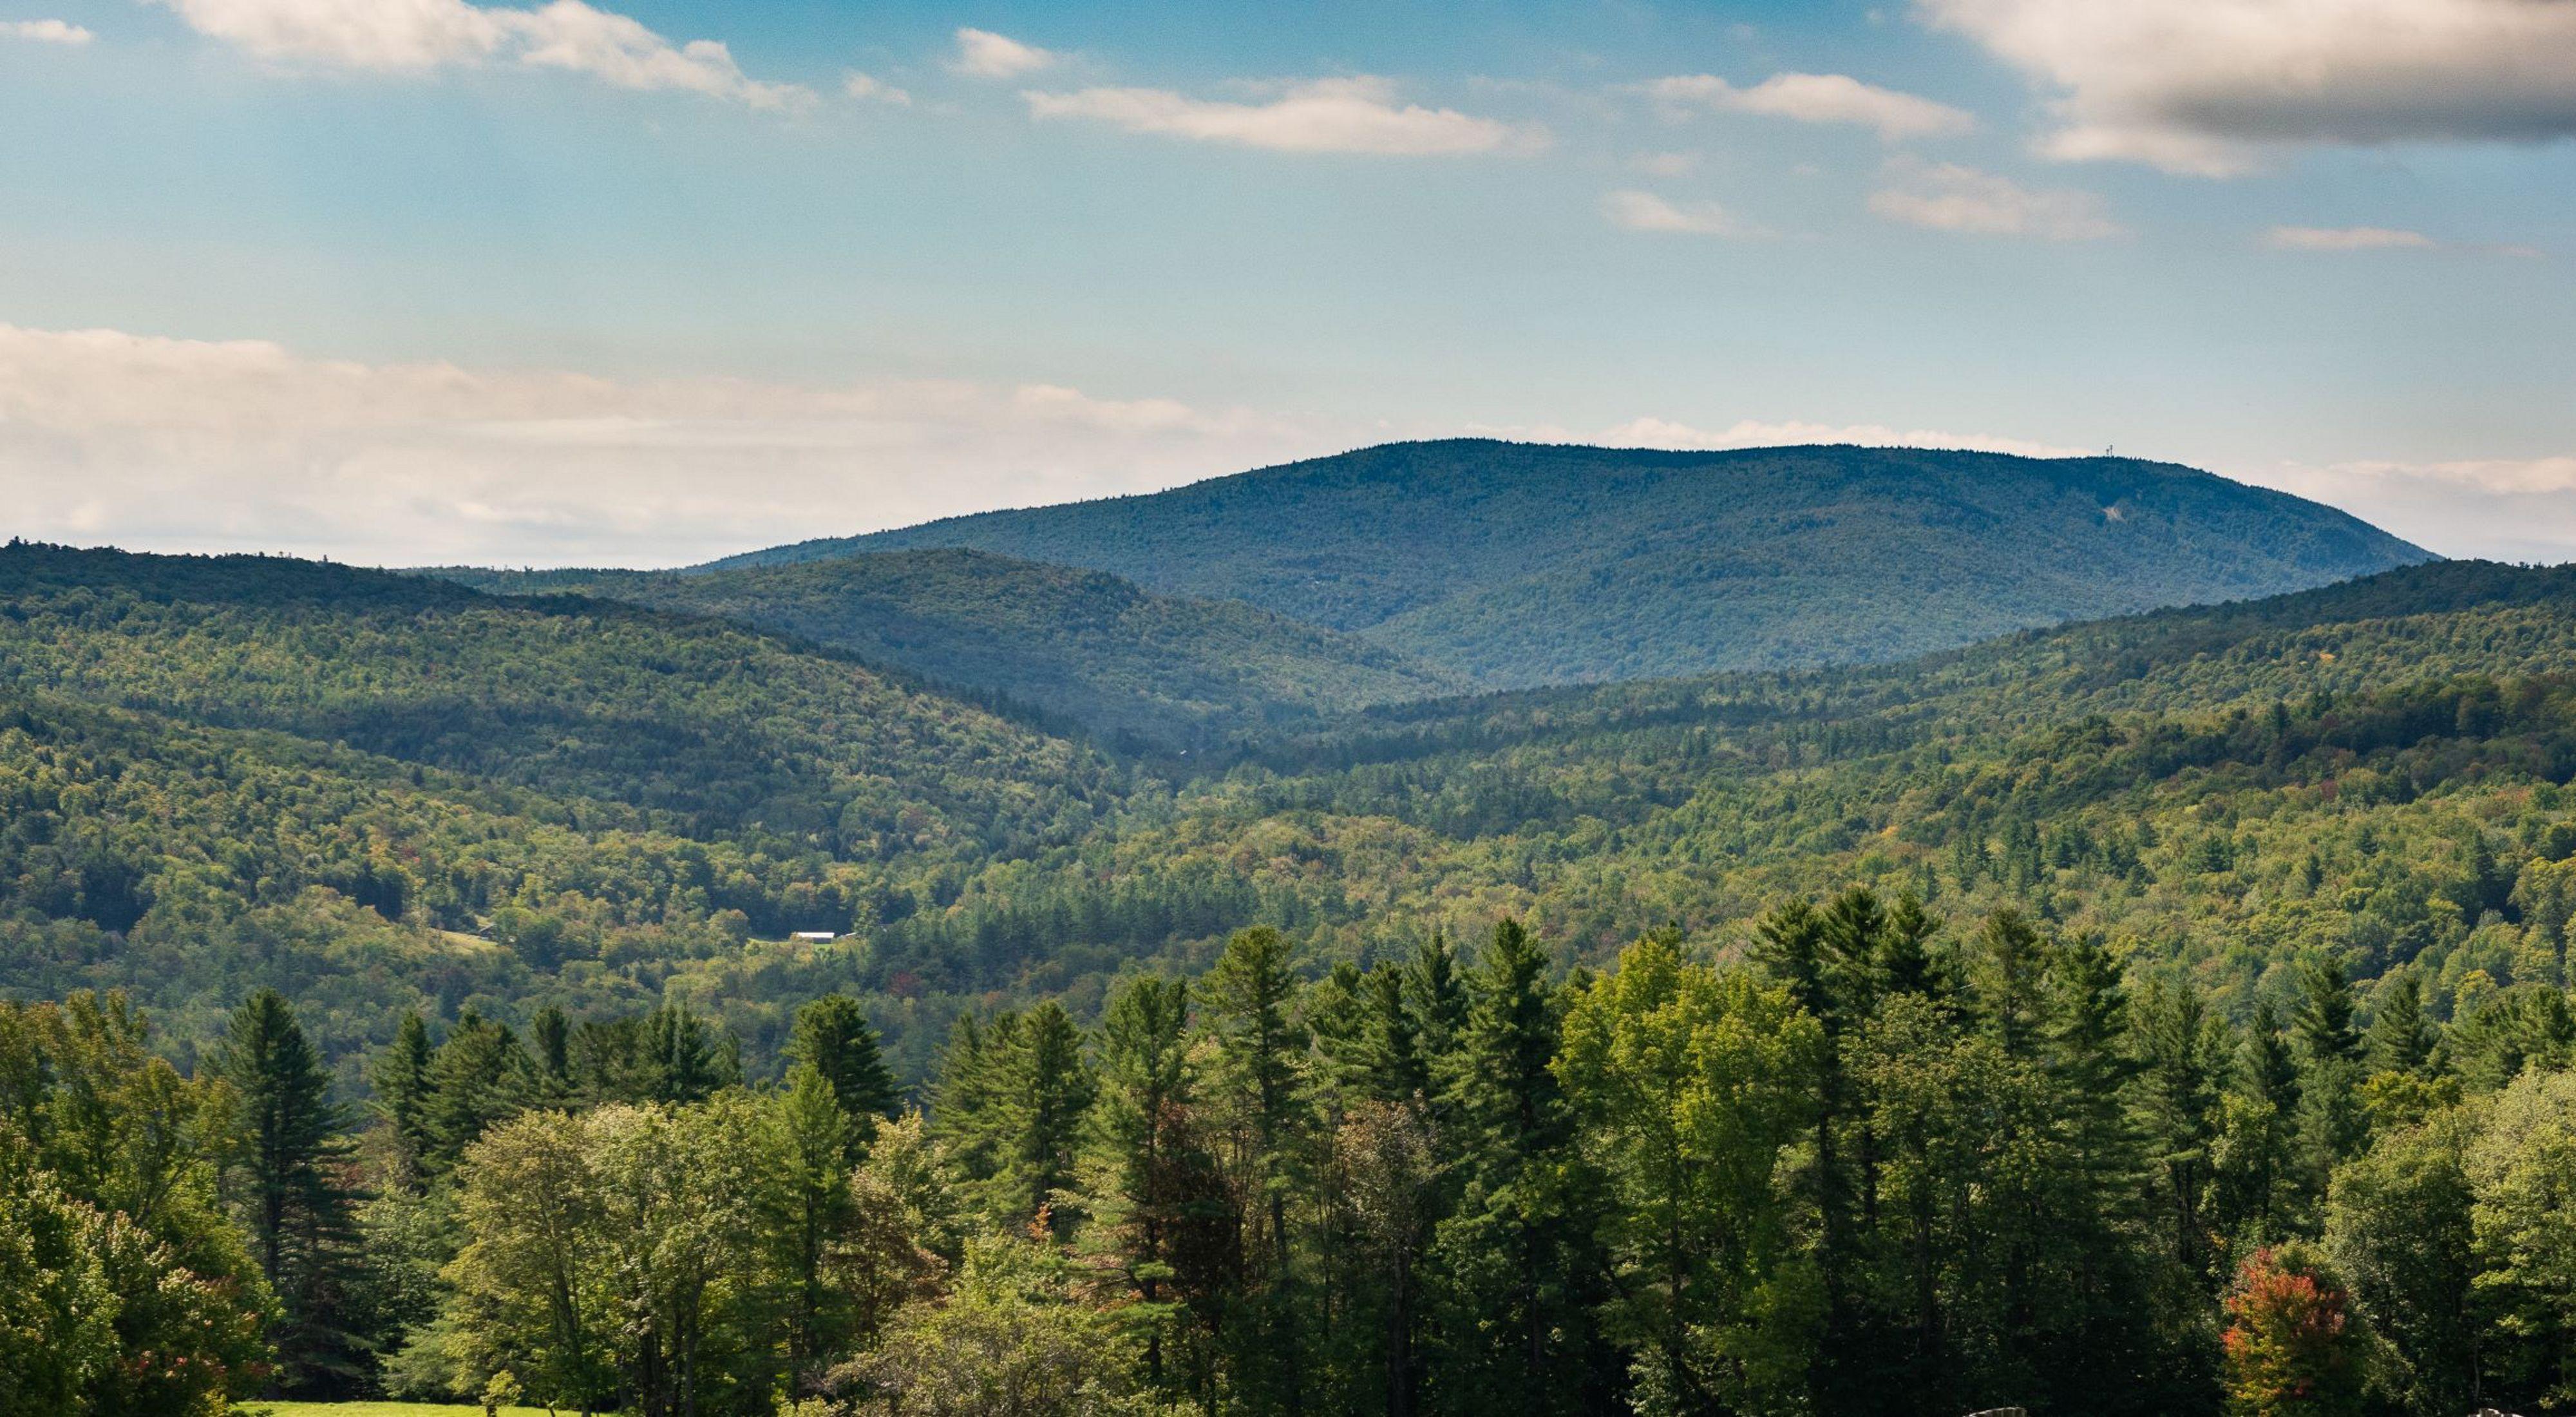 Glebe Mountain Landscape in Vermont